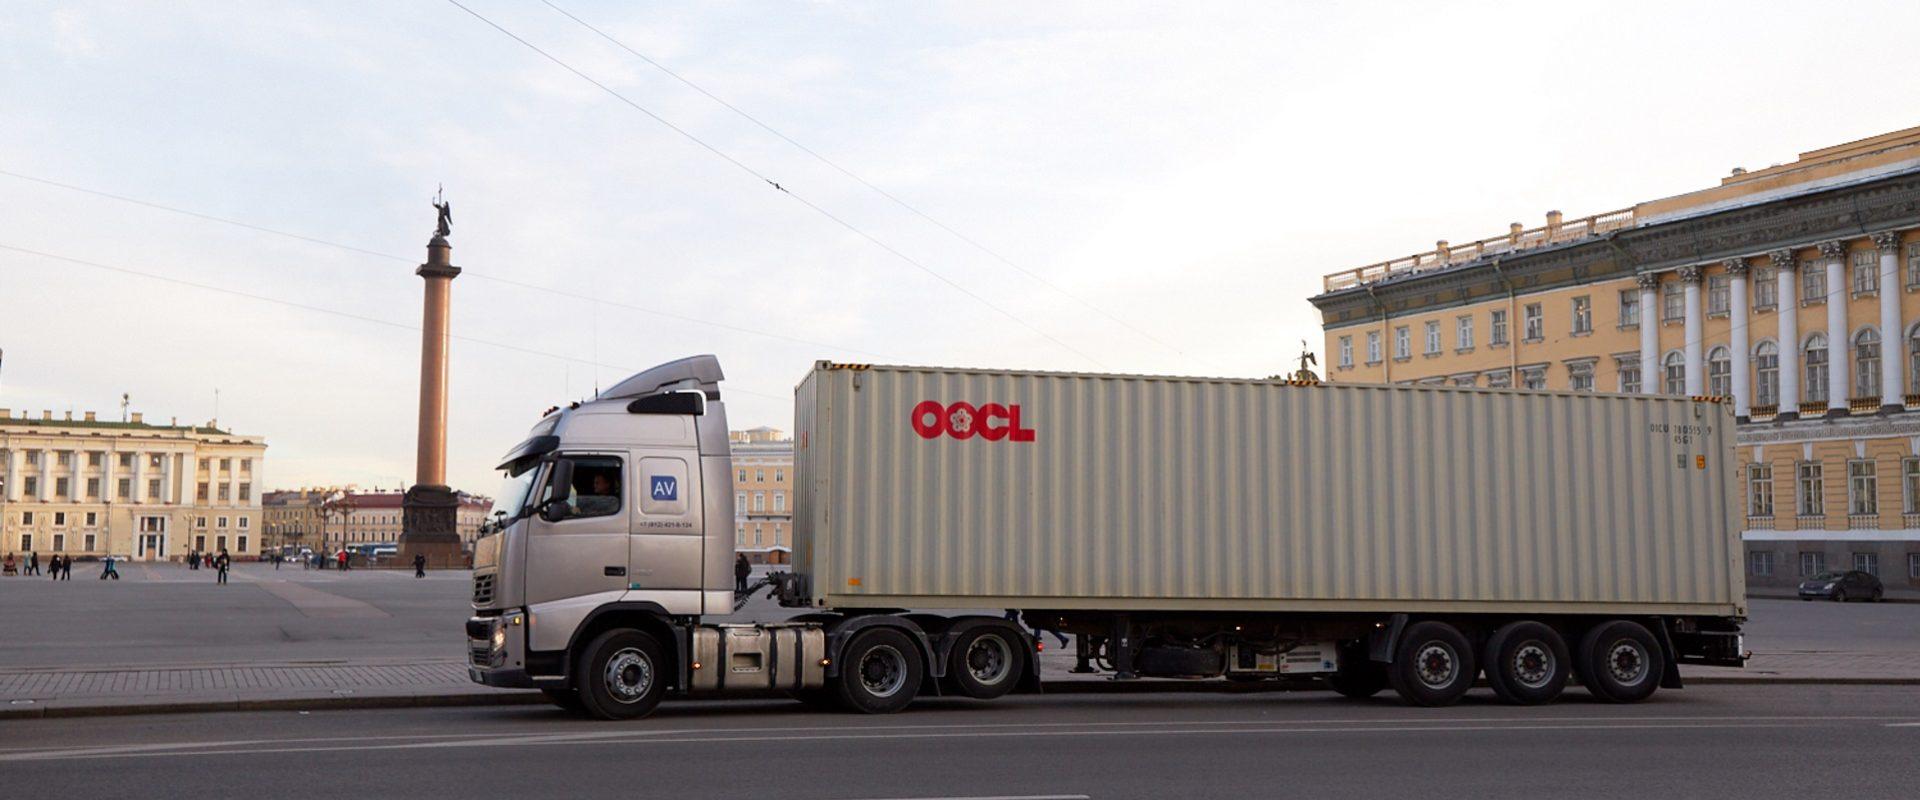 Truck park